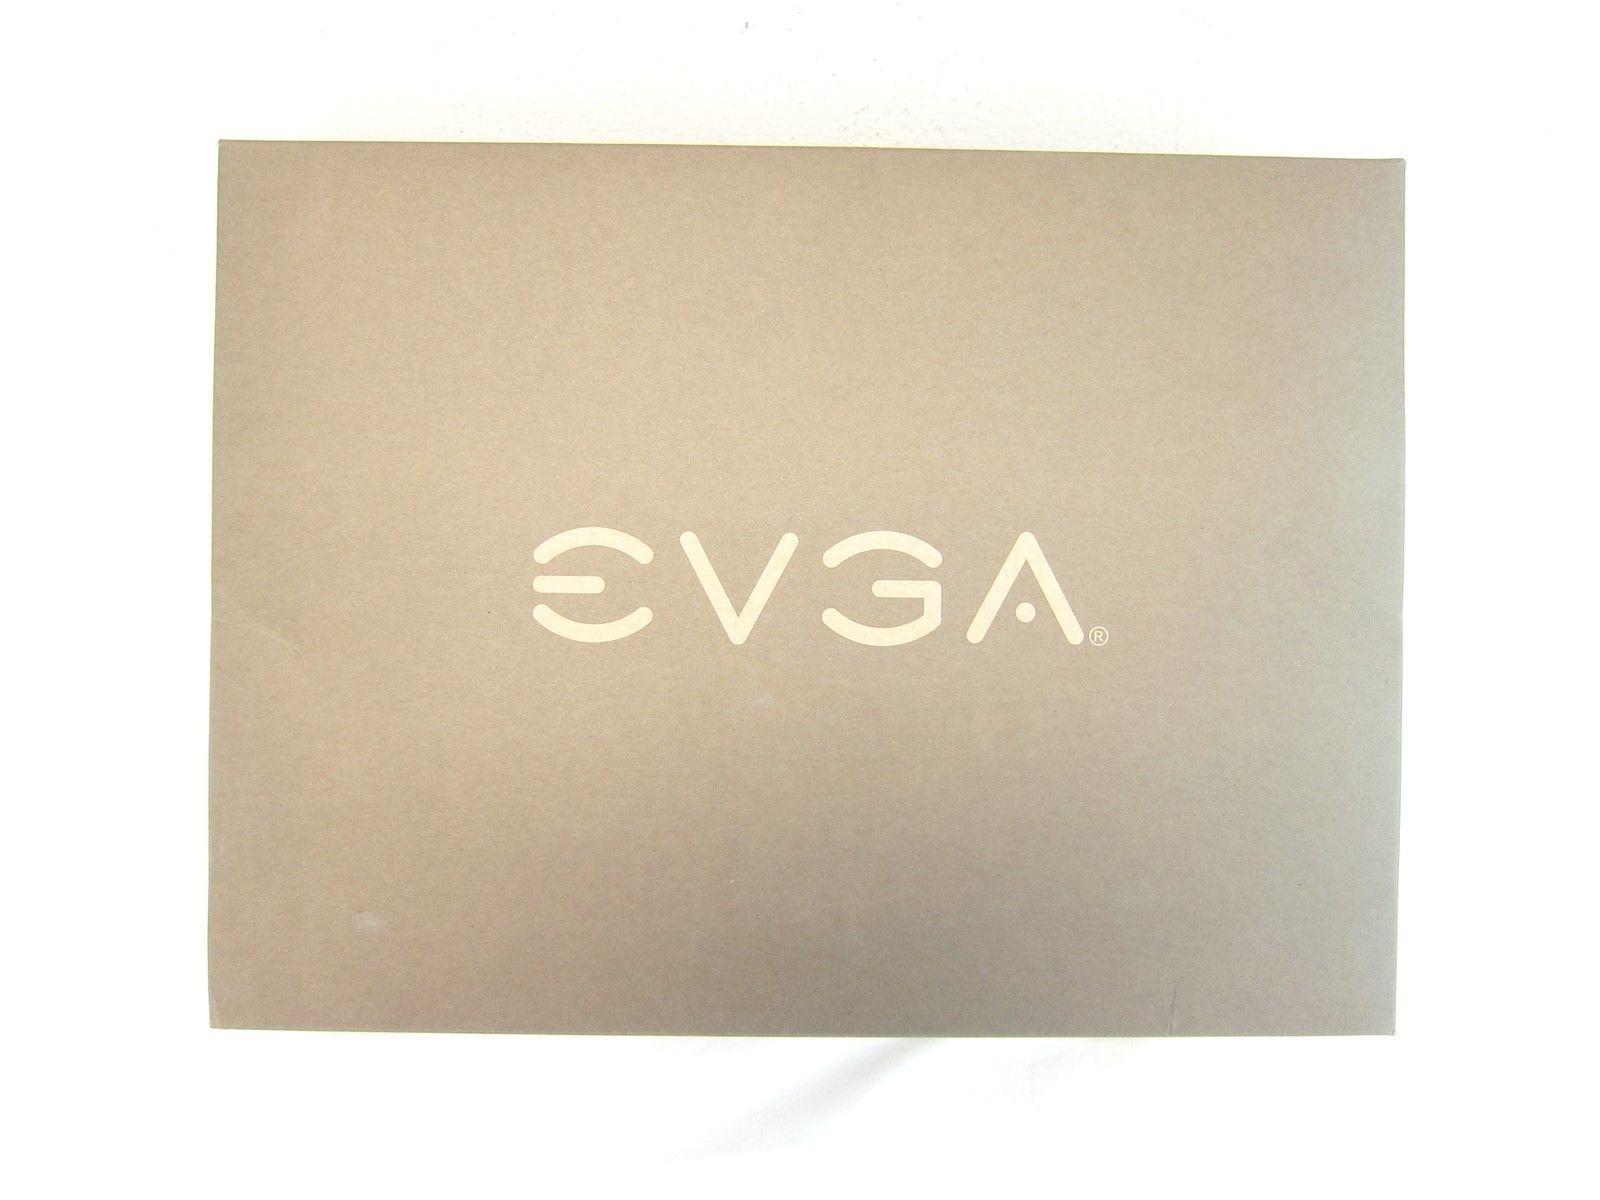 EVGA GeForce GTX 980 Ti 6GB SC GAMING Cooling Graphics Card 06G-P4-4992-KR https://t.co/ZAmQaklZ4D https://t.co/LHFv57u28l